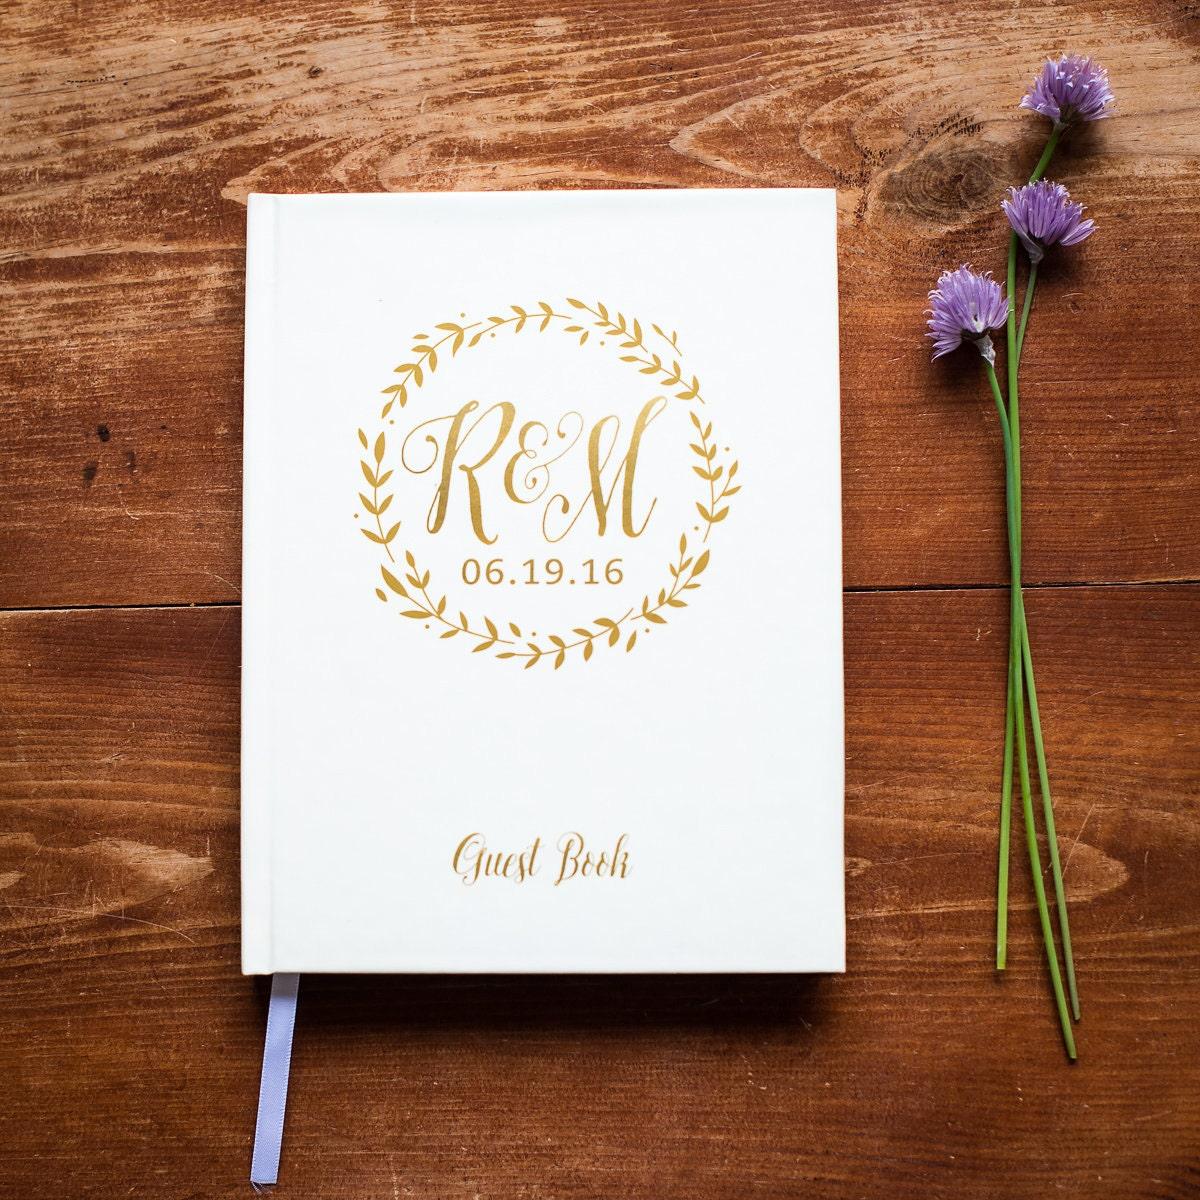 Wedding Guest Book 26 Hardcover Wedding Guestbook Wedding